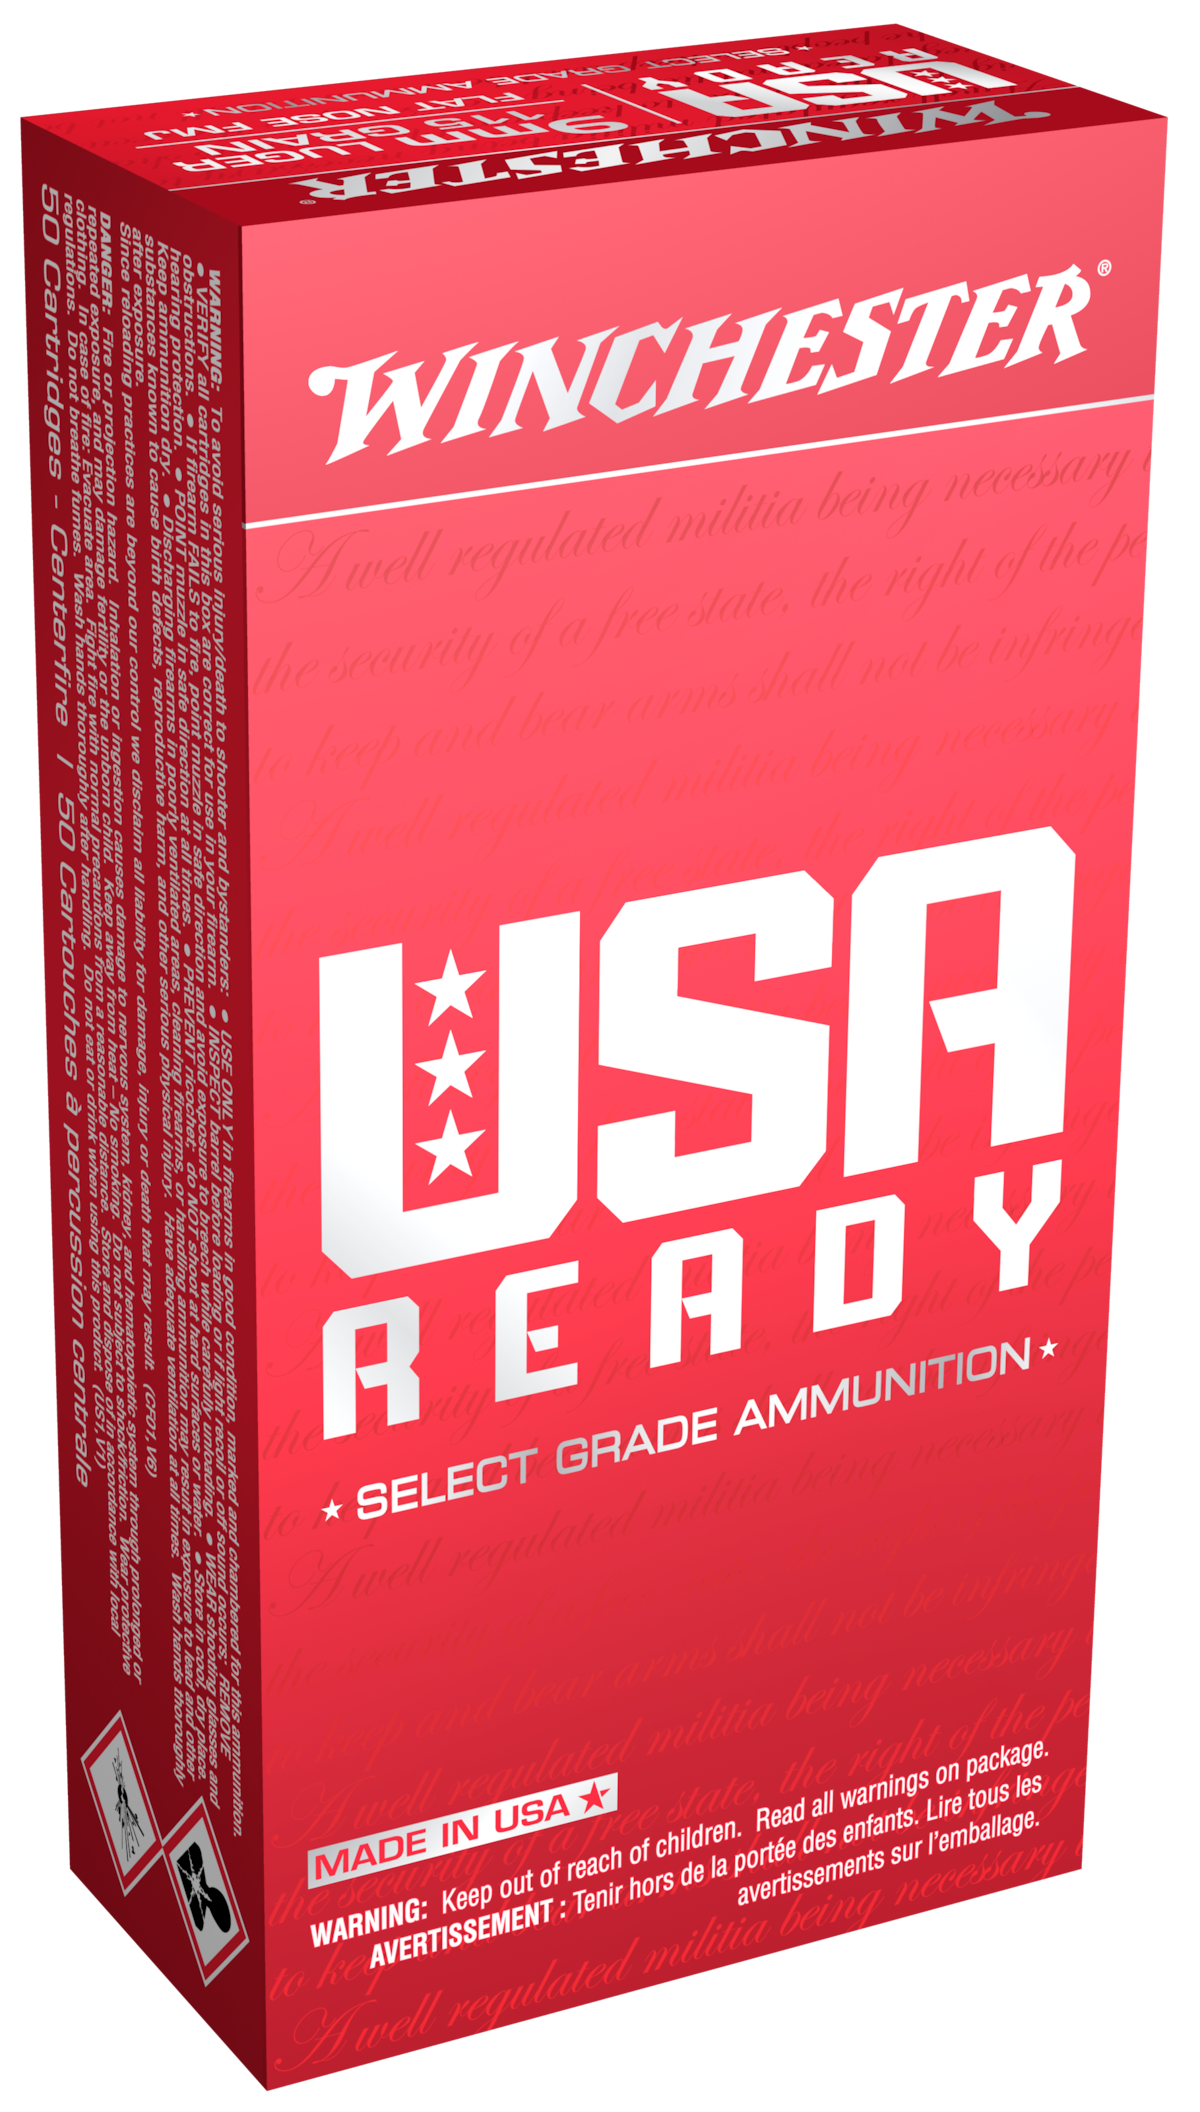 WINCHESTER USA READY